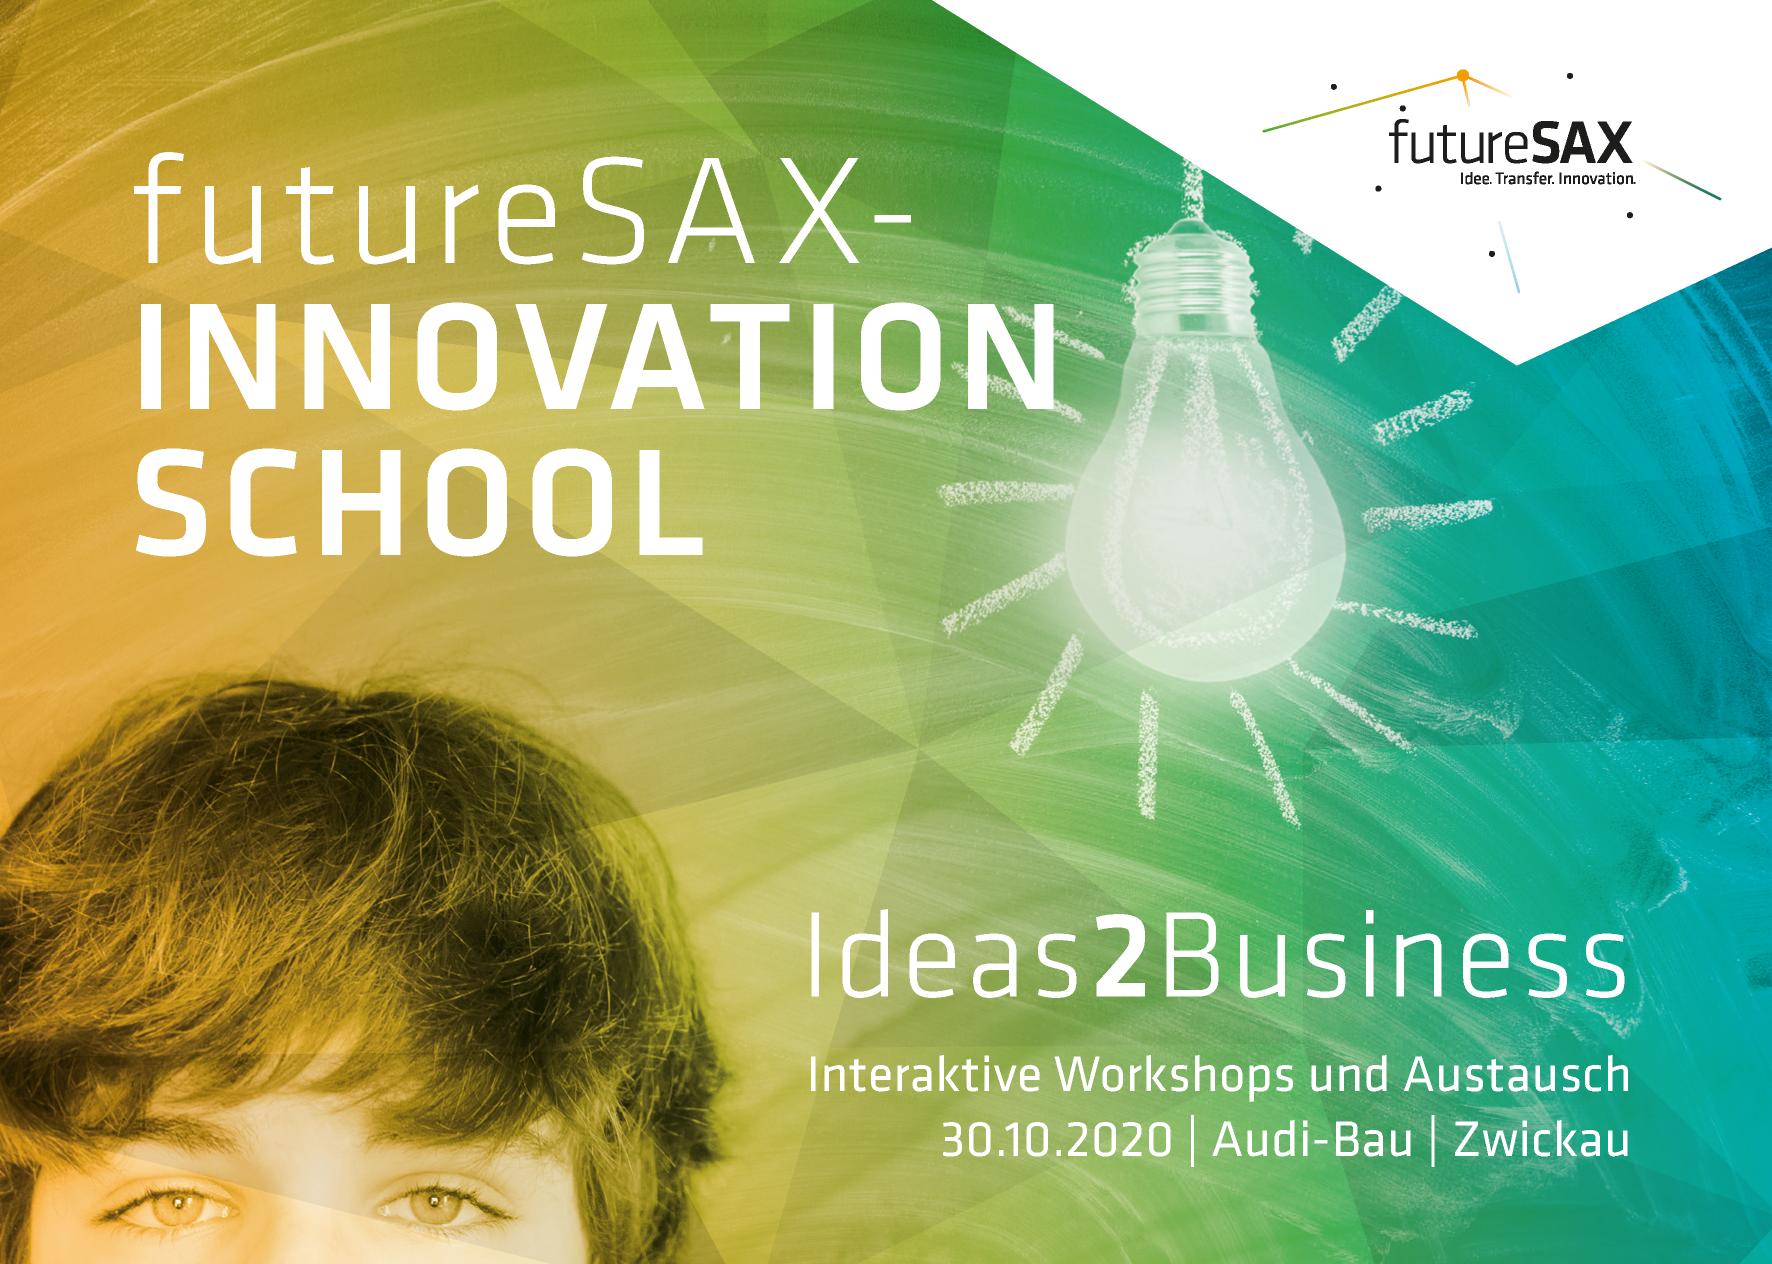 futureSAX-InnovationSchool - Ideas2Business